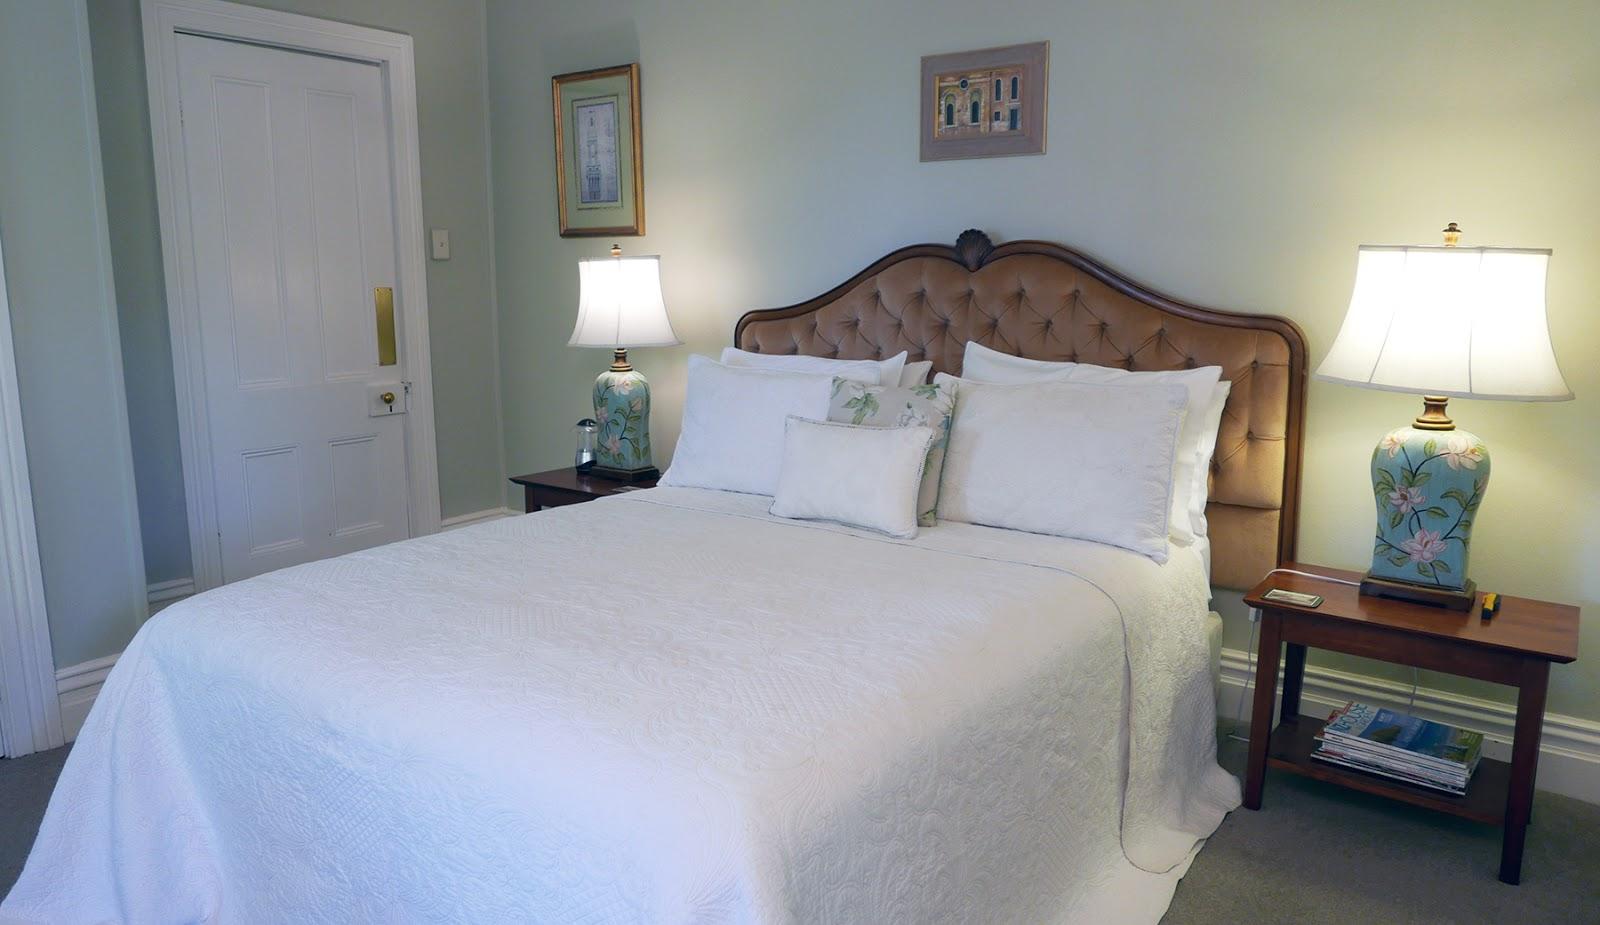 Euriental   luxury travel & style   Woodside, Marlborough B&B, New Zealand